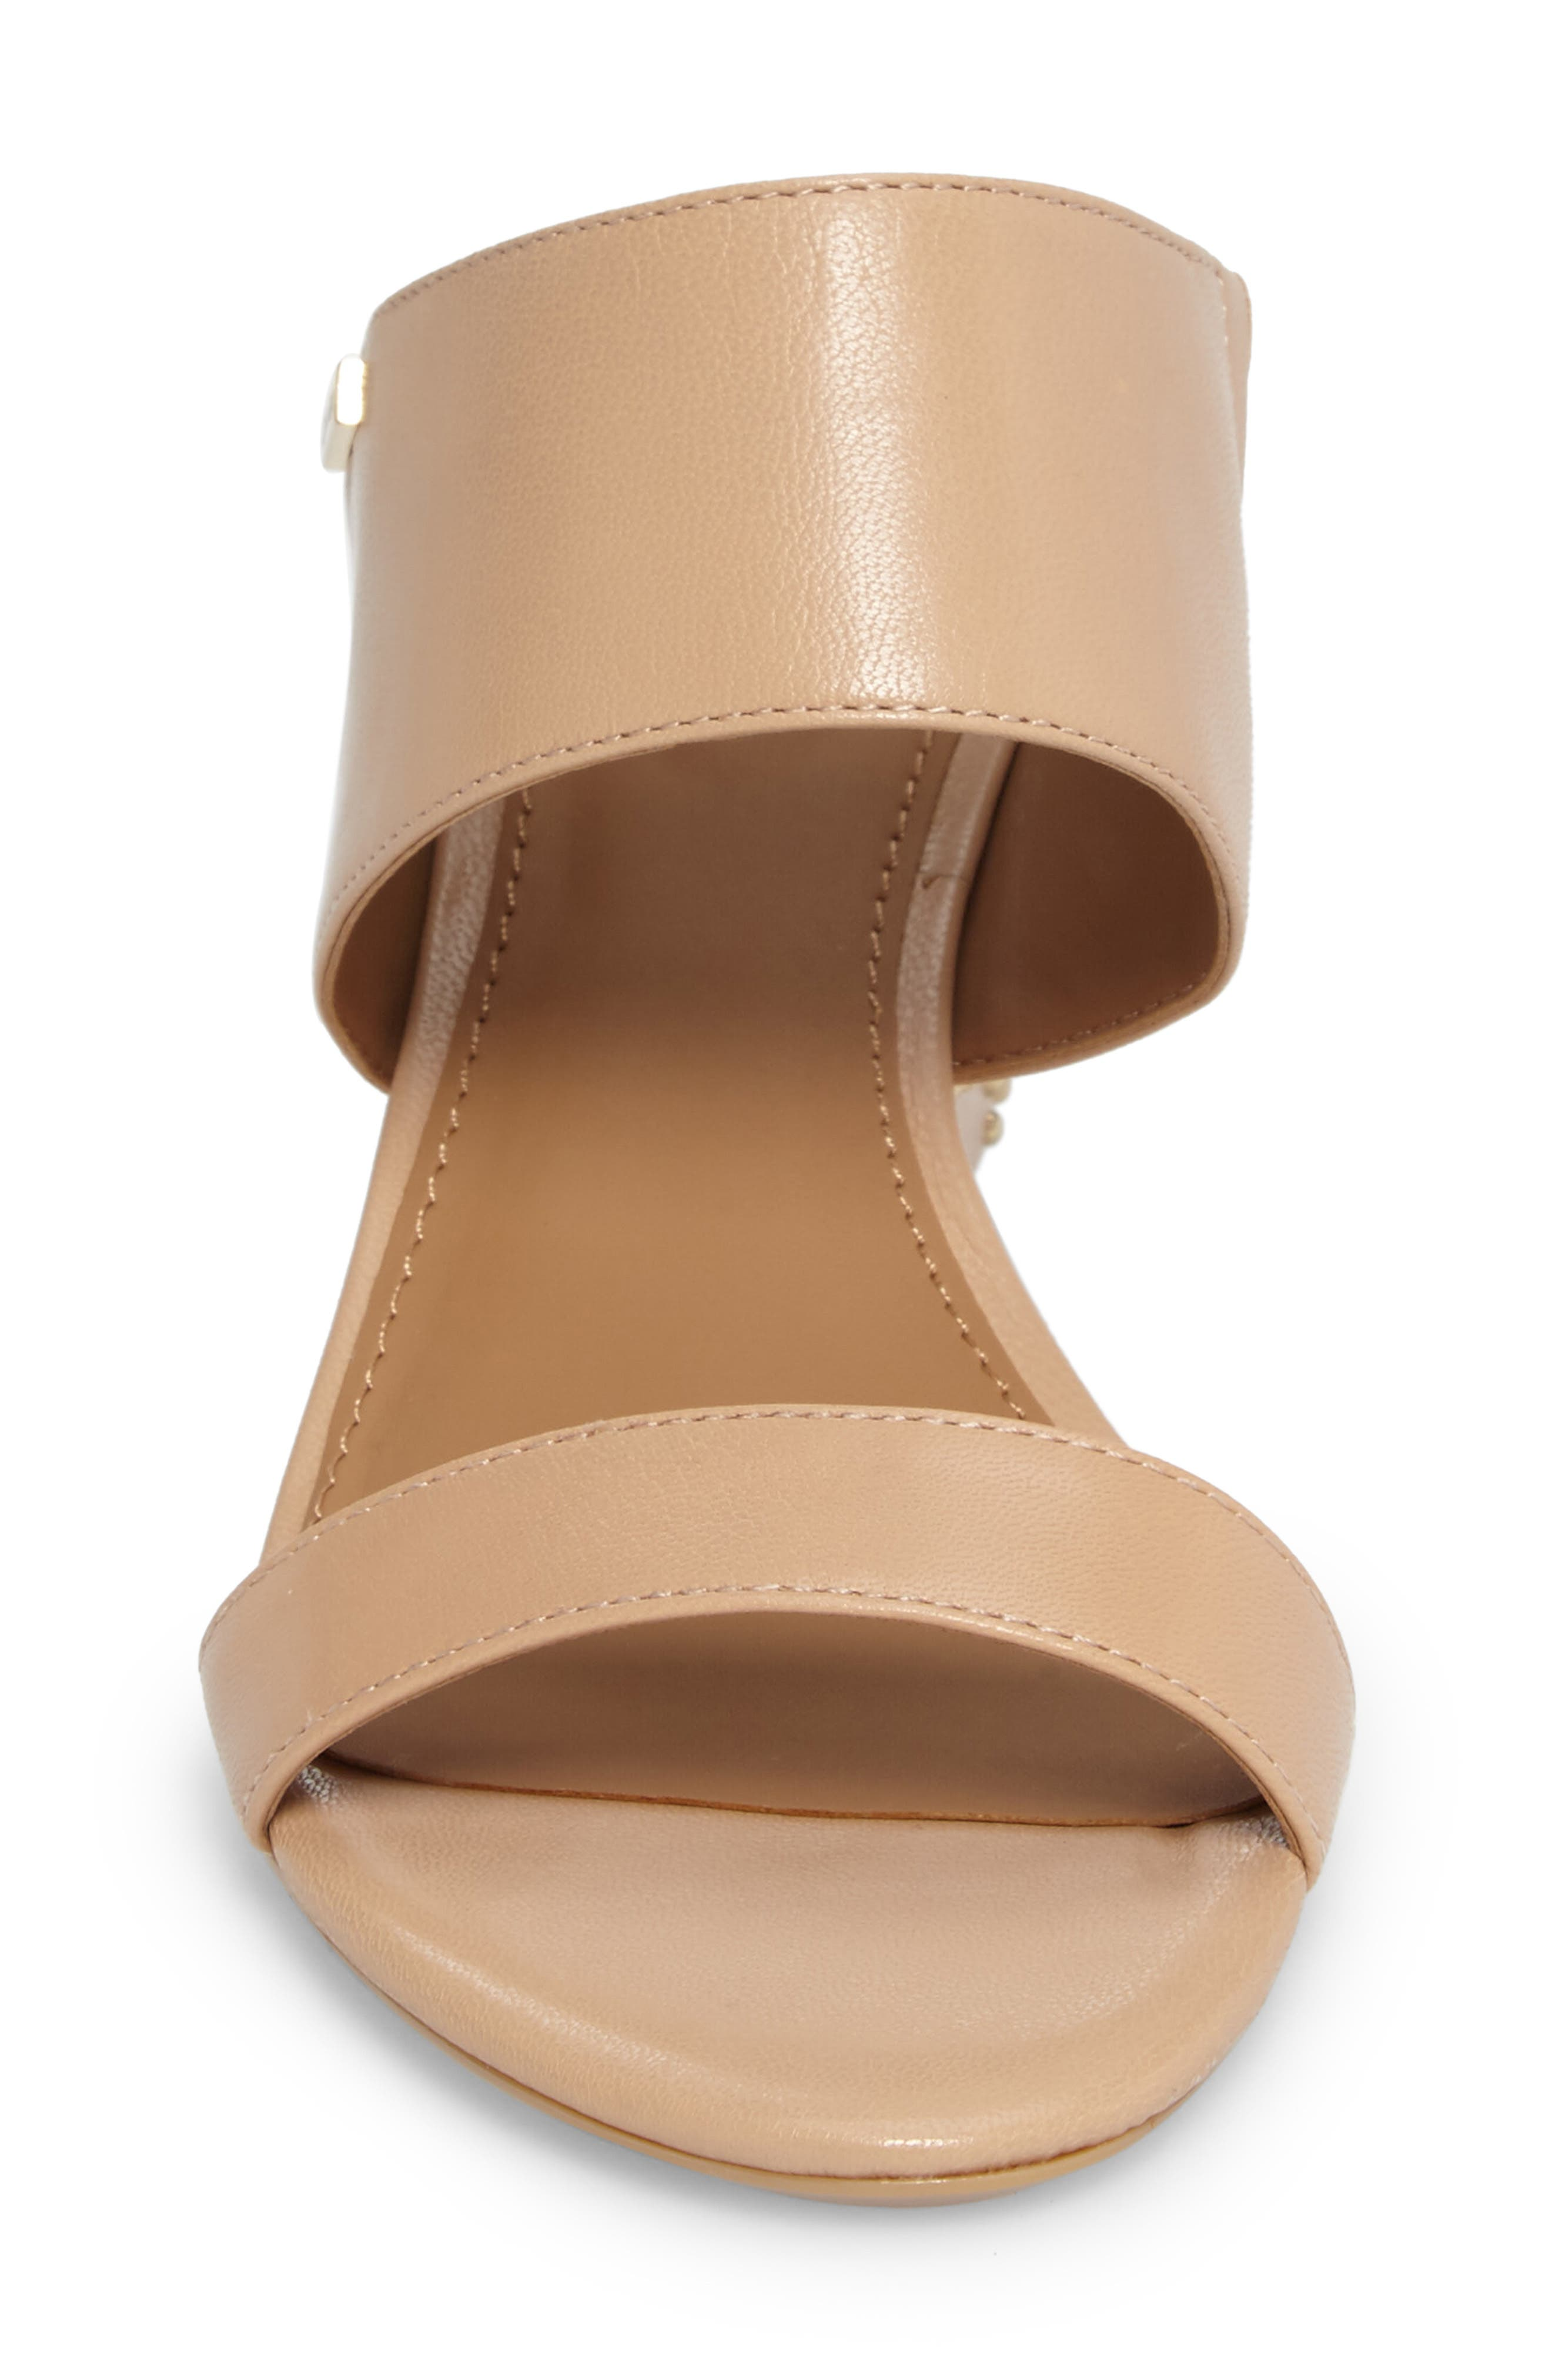 Phyllis Studded Wedge Sandal,                             Alternate thumbnail 16, color,